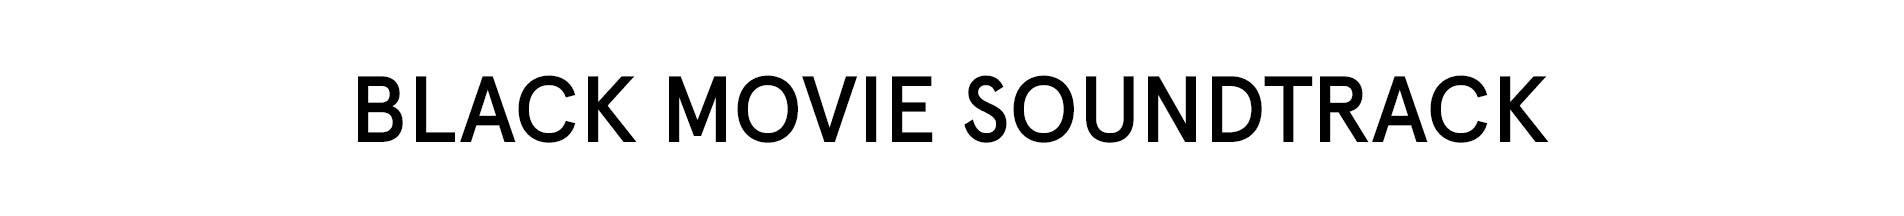 Black Movie Soundtrack